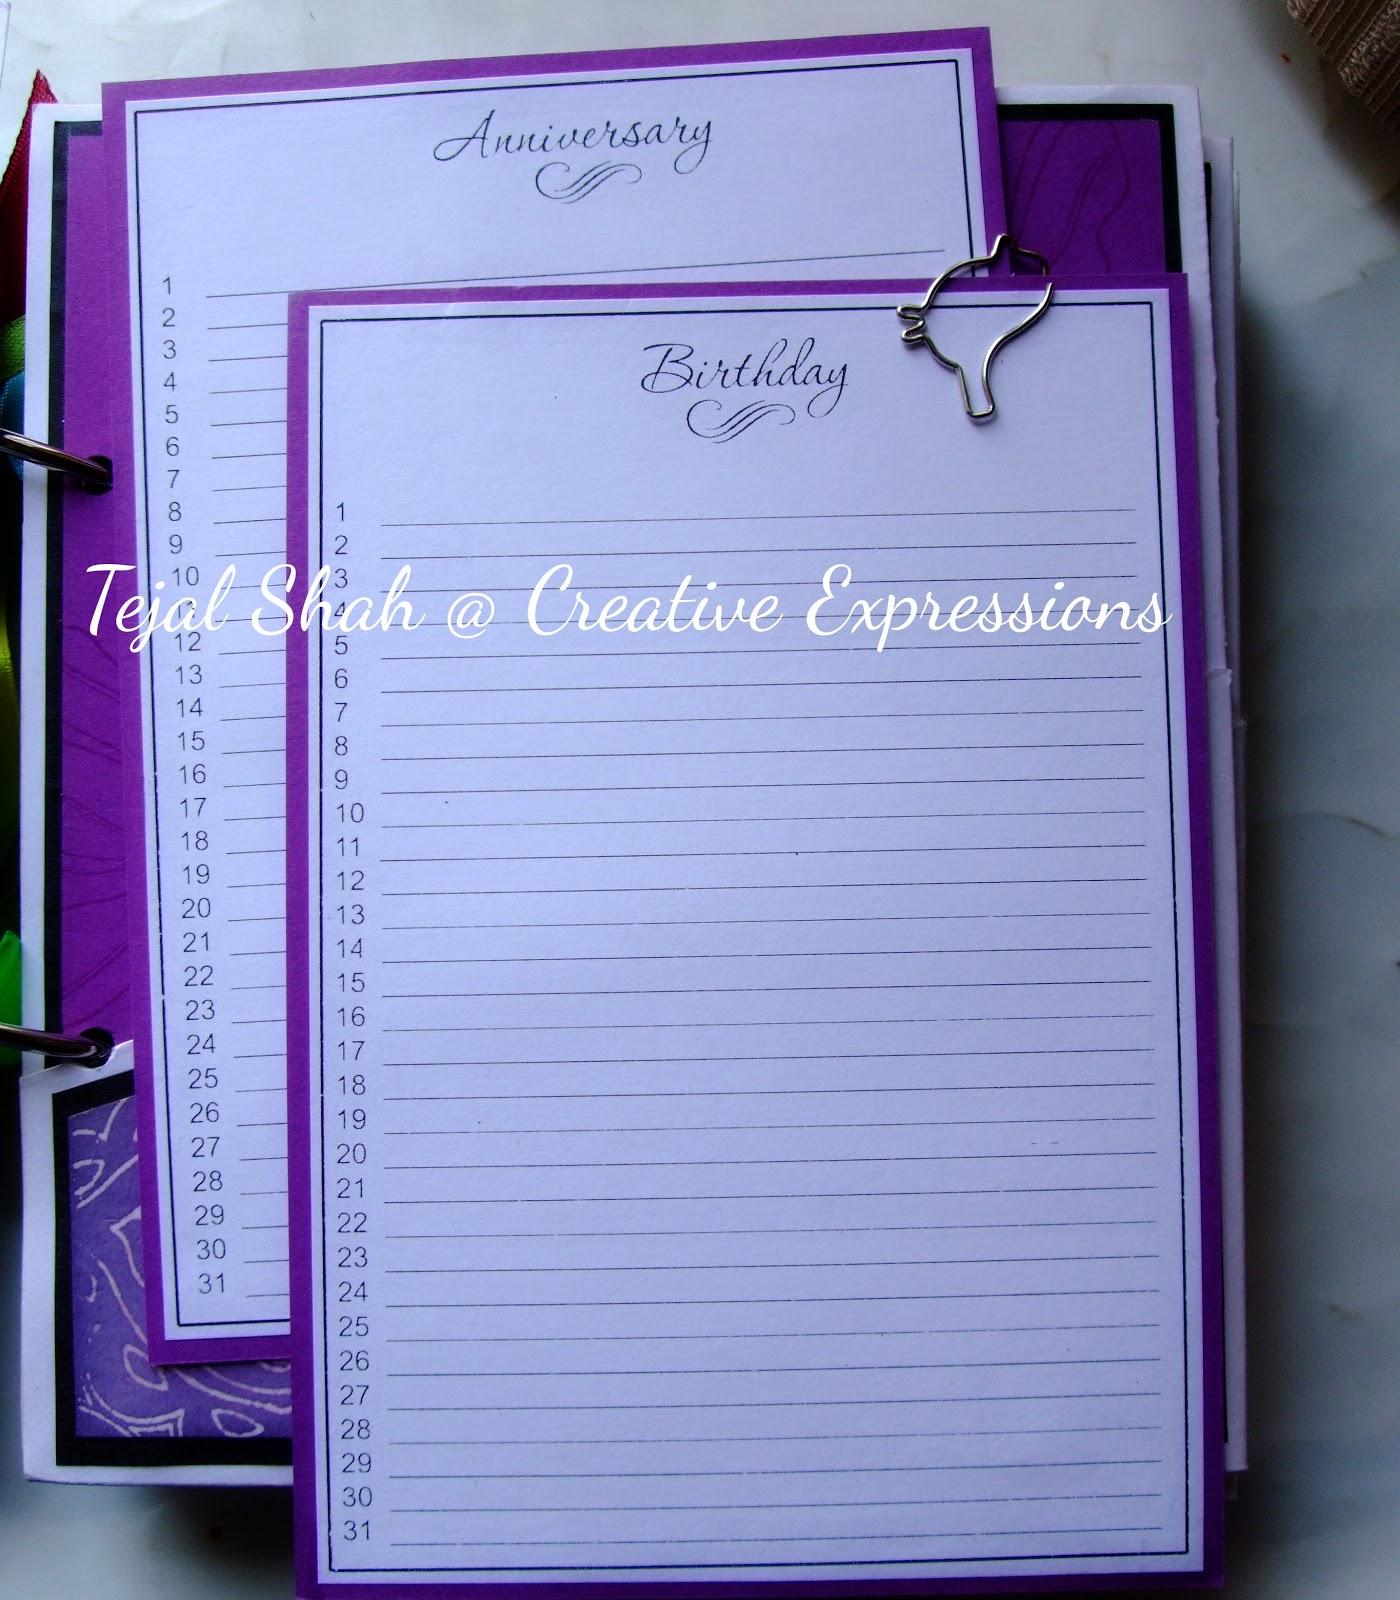 Creative Expressions Store: Birthday Anniversary Reminder